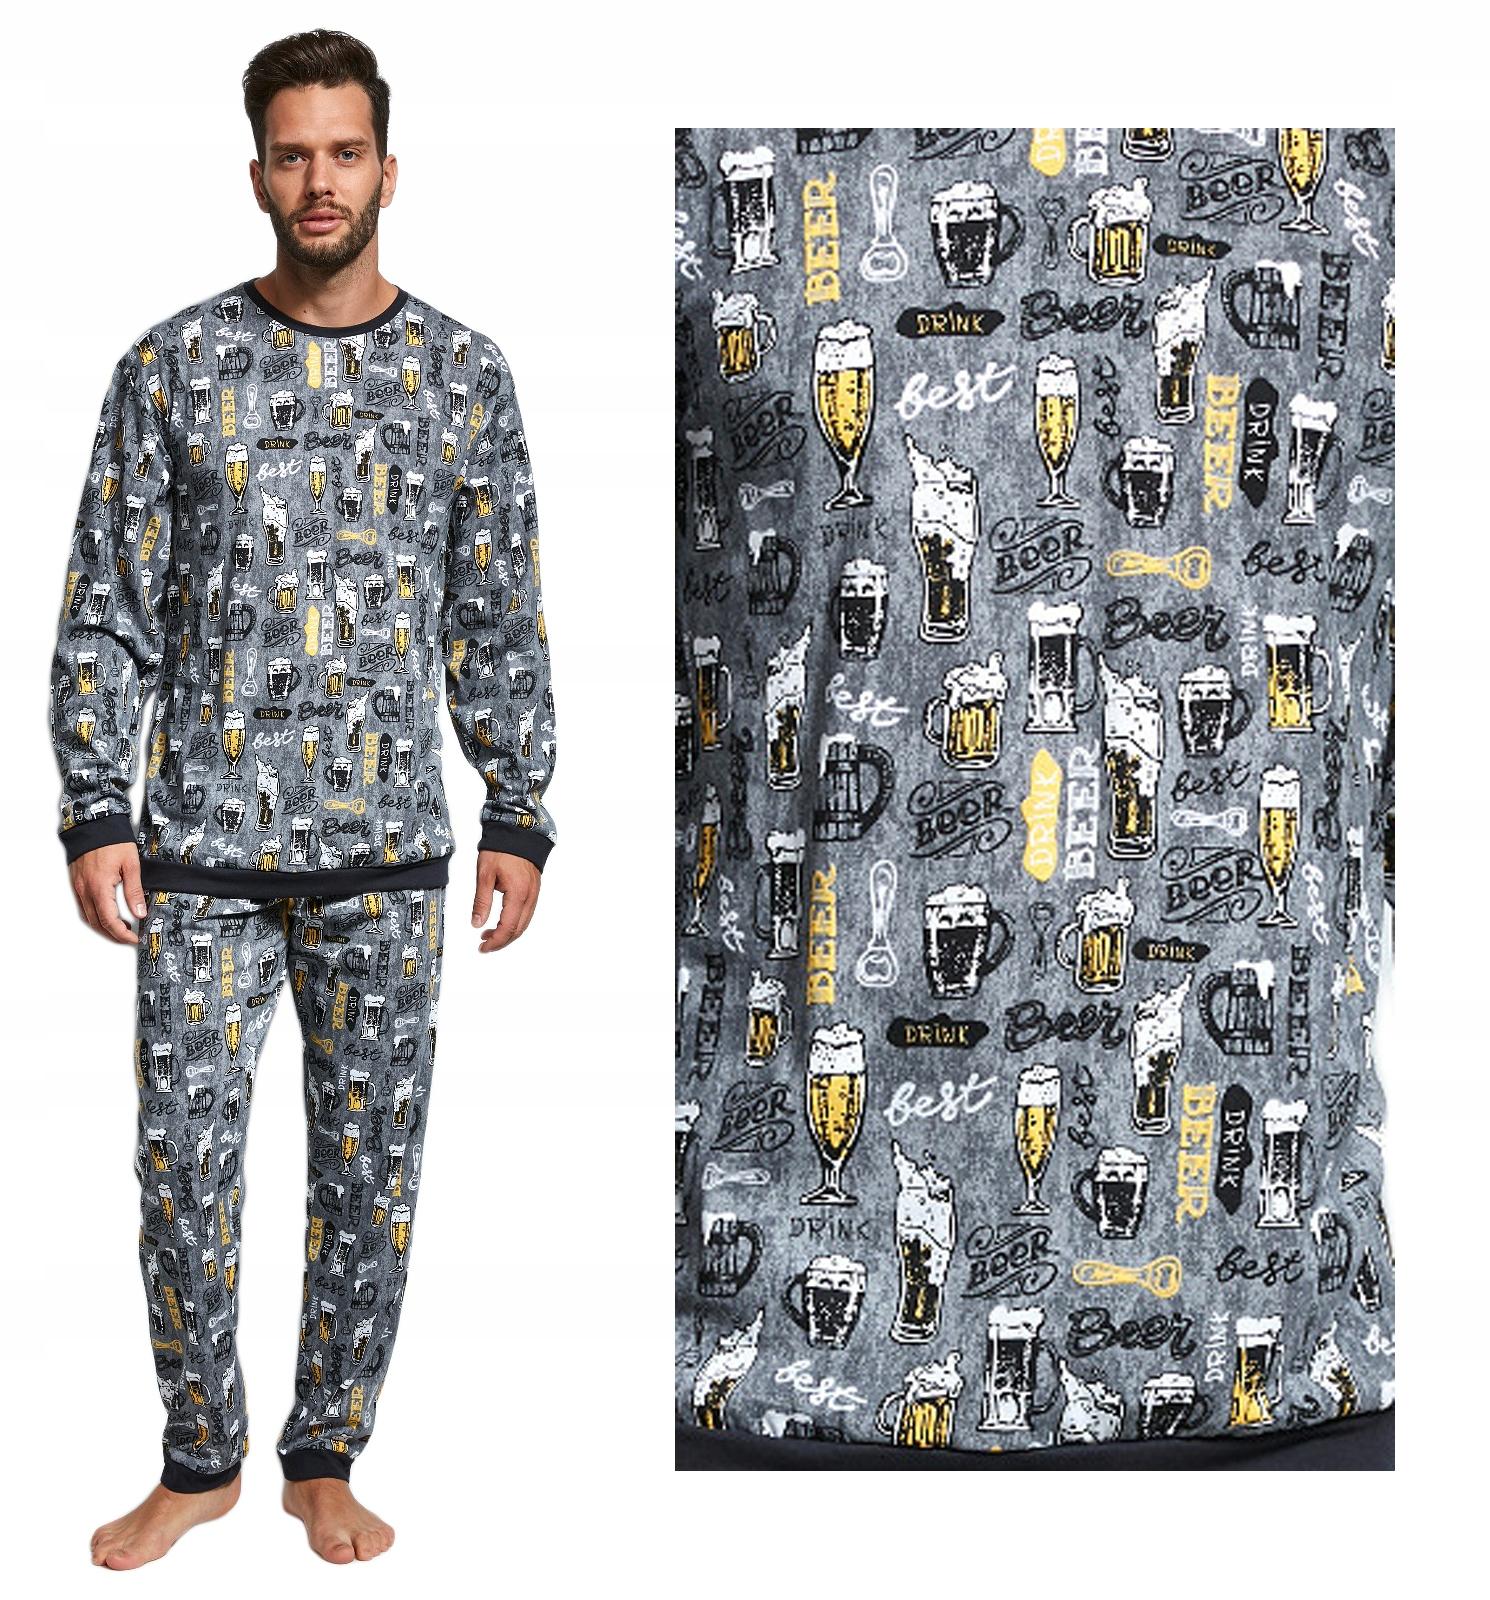 fda536dcdf0807 piżama męska CORNETTE 195/123 PIWO kufel / S - 7488629965 ...